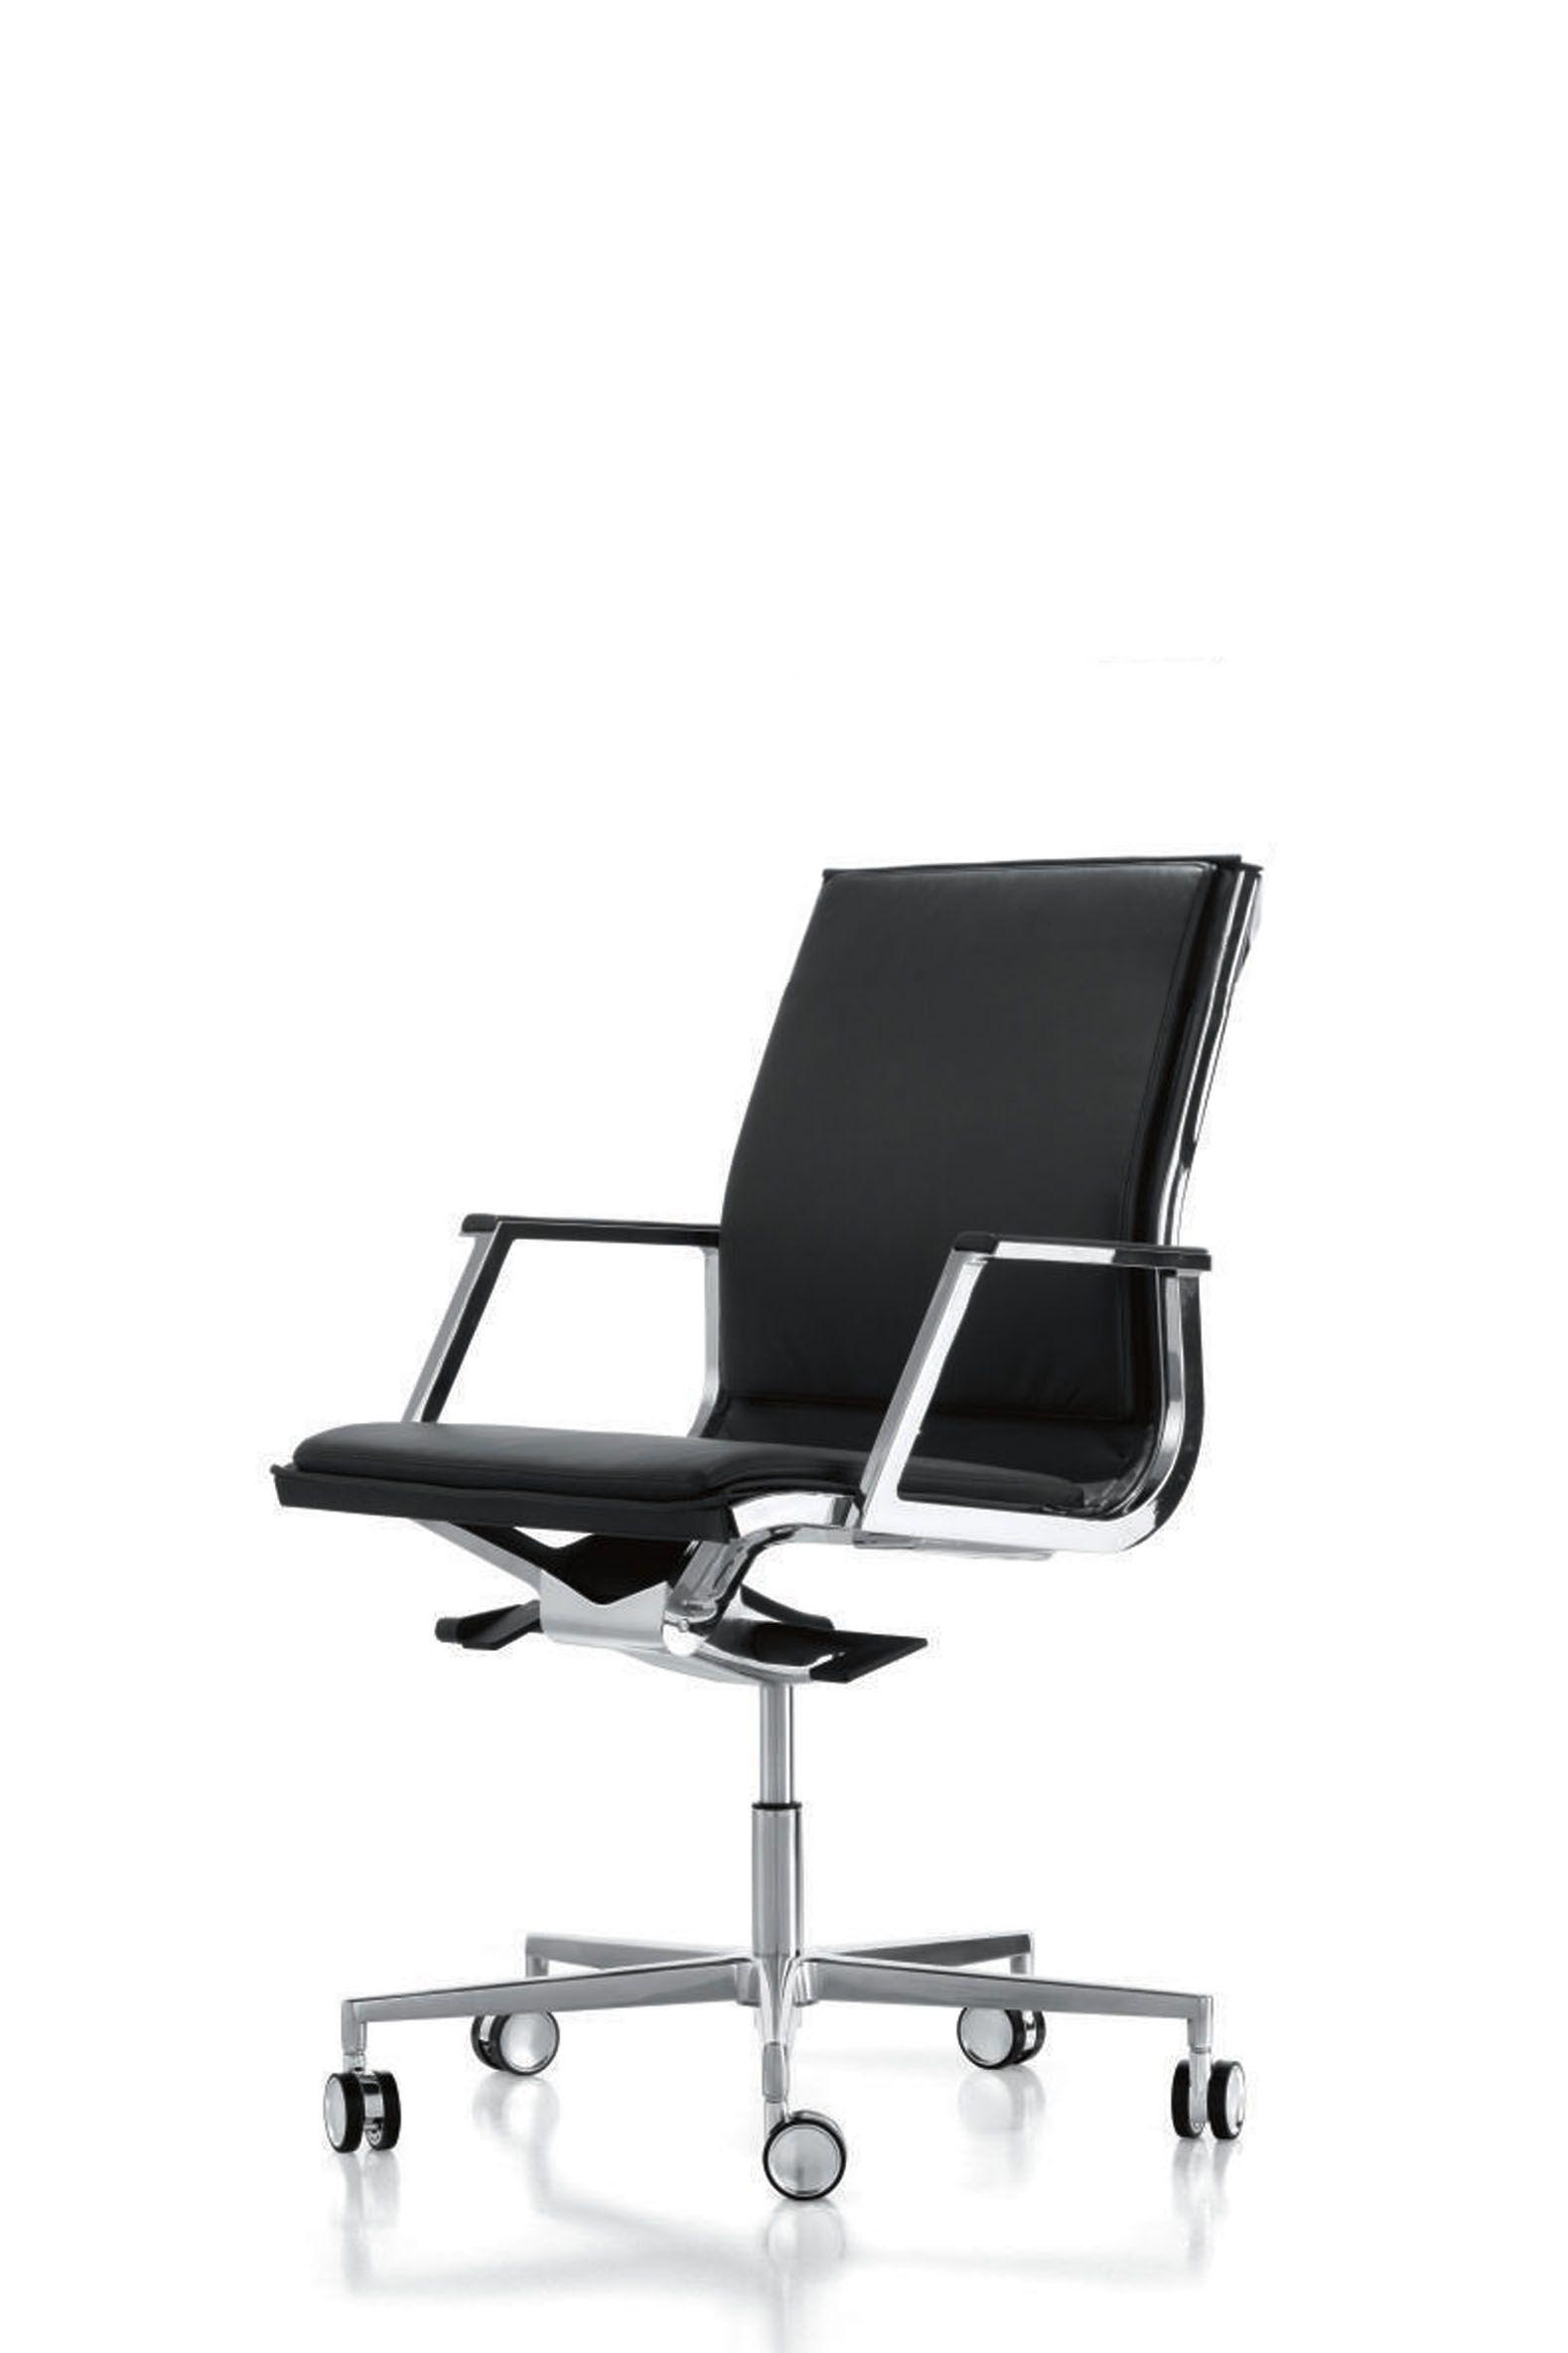 Ergonomic Chair Là Gì Covers For Sale South Africa Gordon International Calculus Conference Pinterest